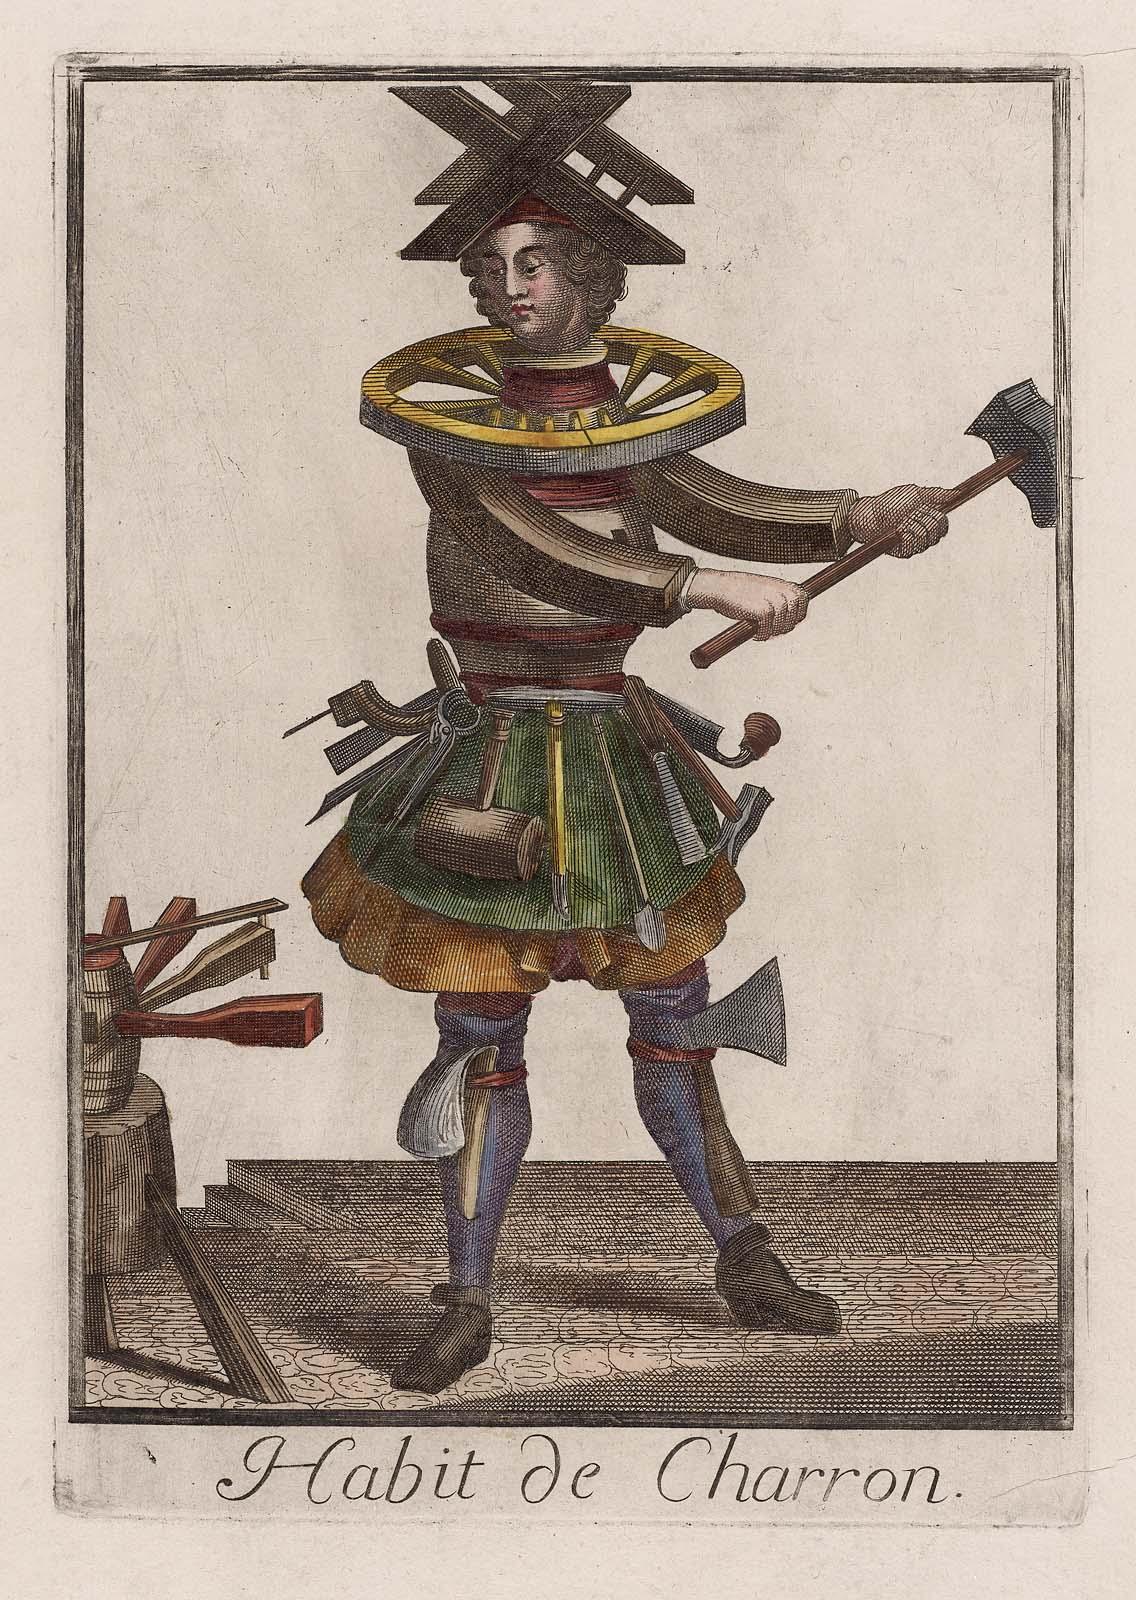 charron-wheelwright.jpg